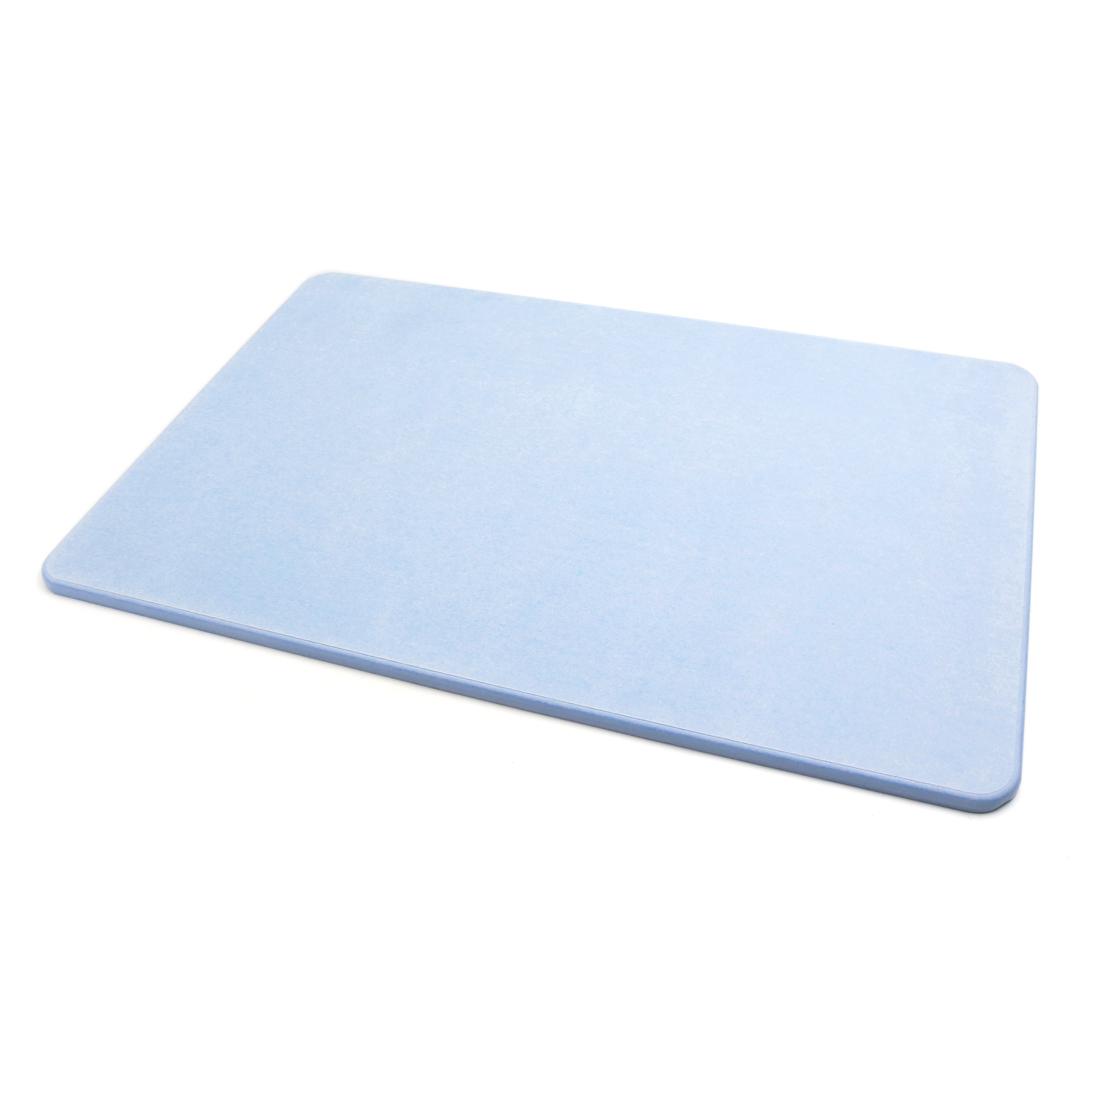 Light Blue Bath Mat Diatomaceous Earth Absorbent Fast Drying Anti Slip Bathroom Floor Mats